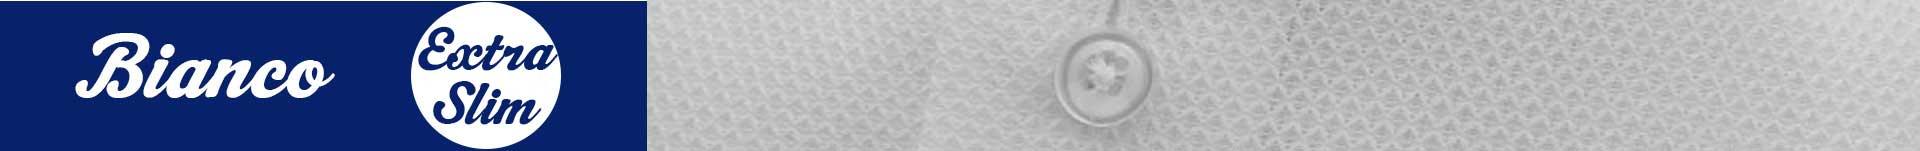 Bianco - Extra Slim